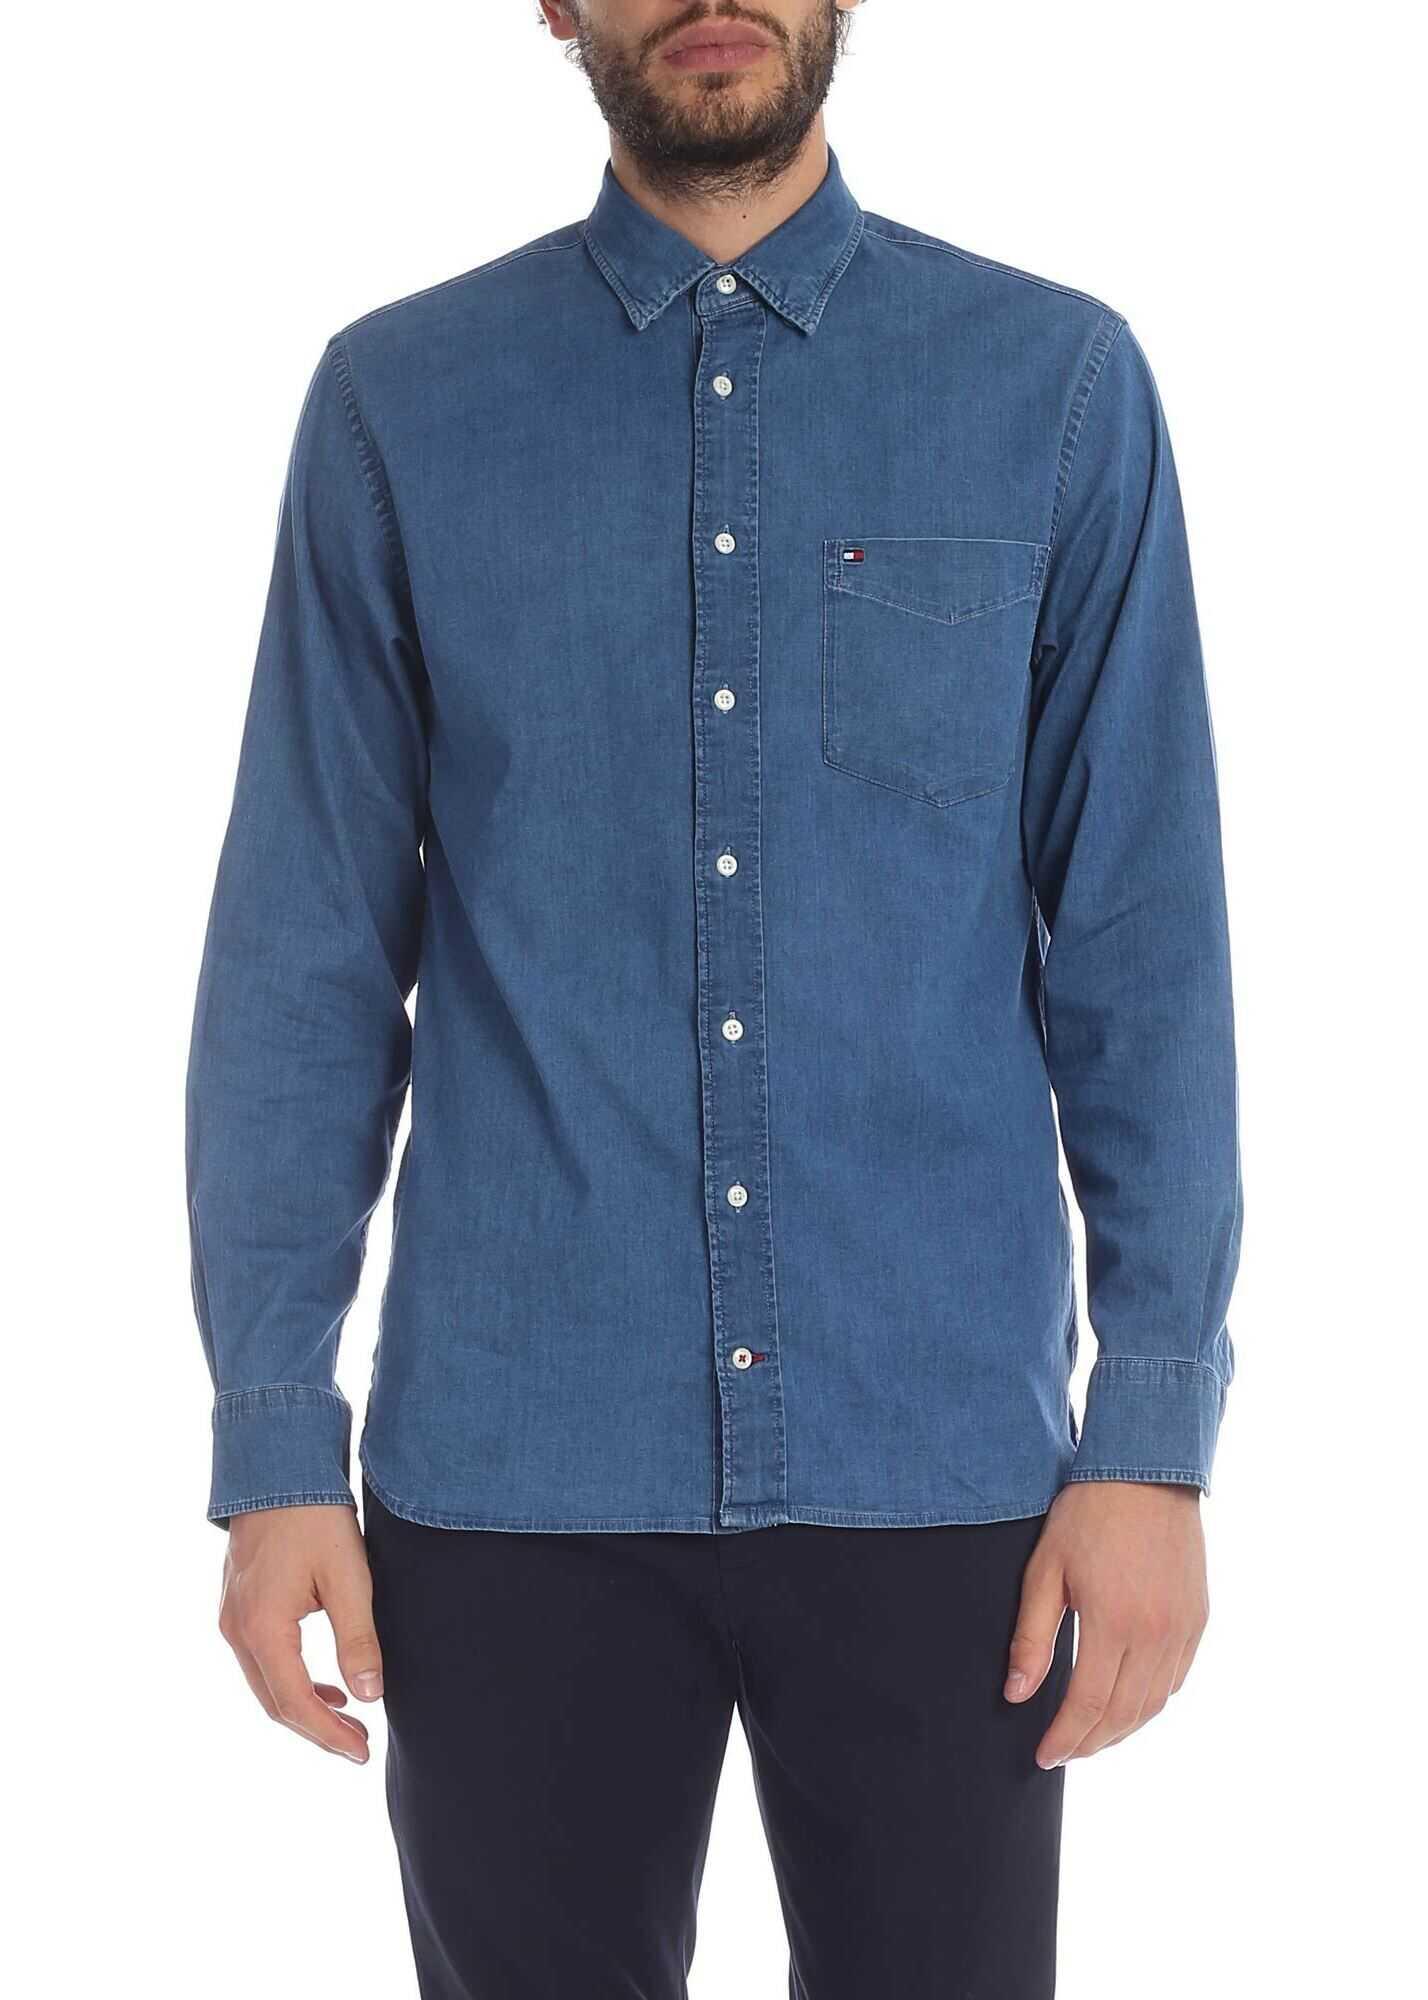 Tommy Hilfiger Blue Denim Shirt With Logo Embroidery Blue